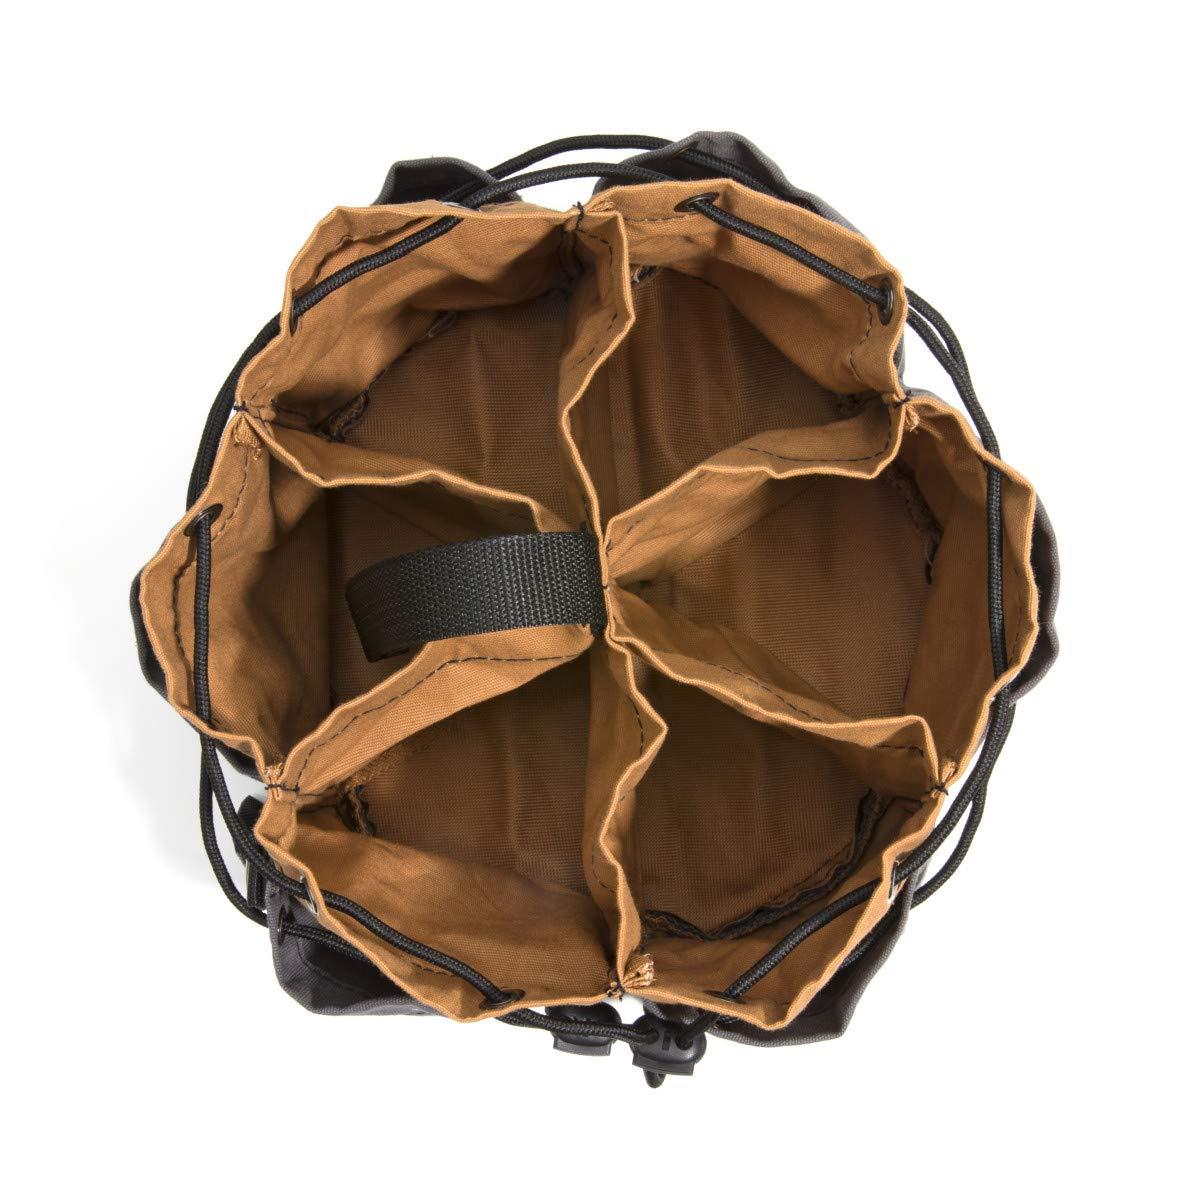 Dickies Work Gear – 12-Pocket Parachute Style Bag – 57004 – Grey/Tan Parachute Work Bag – Tool Bag – Construction – Snap-Secured Tape Strap – 8.8 oz. by Dickies Work Gear (Image #3)